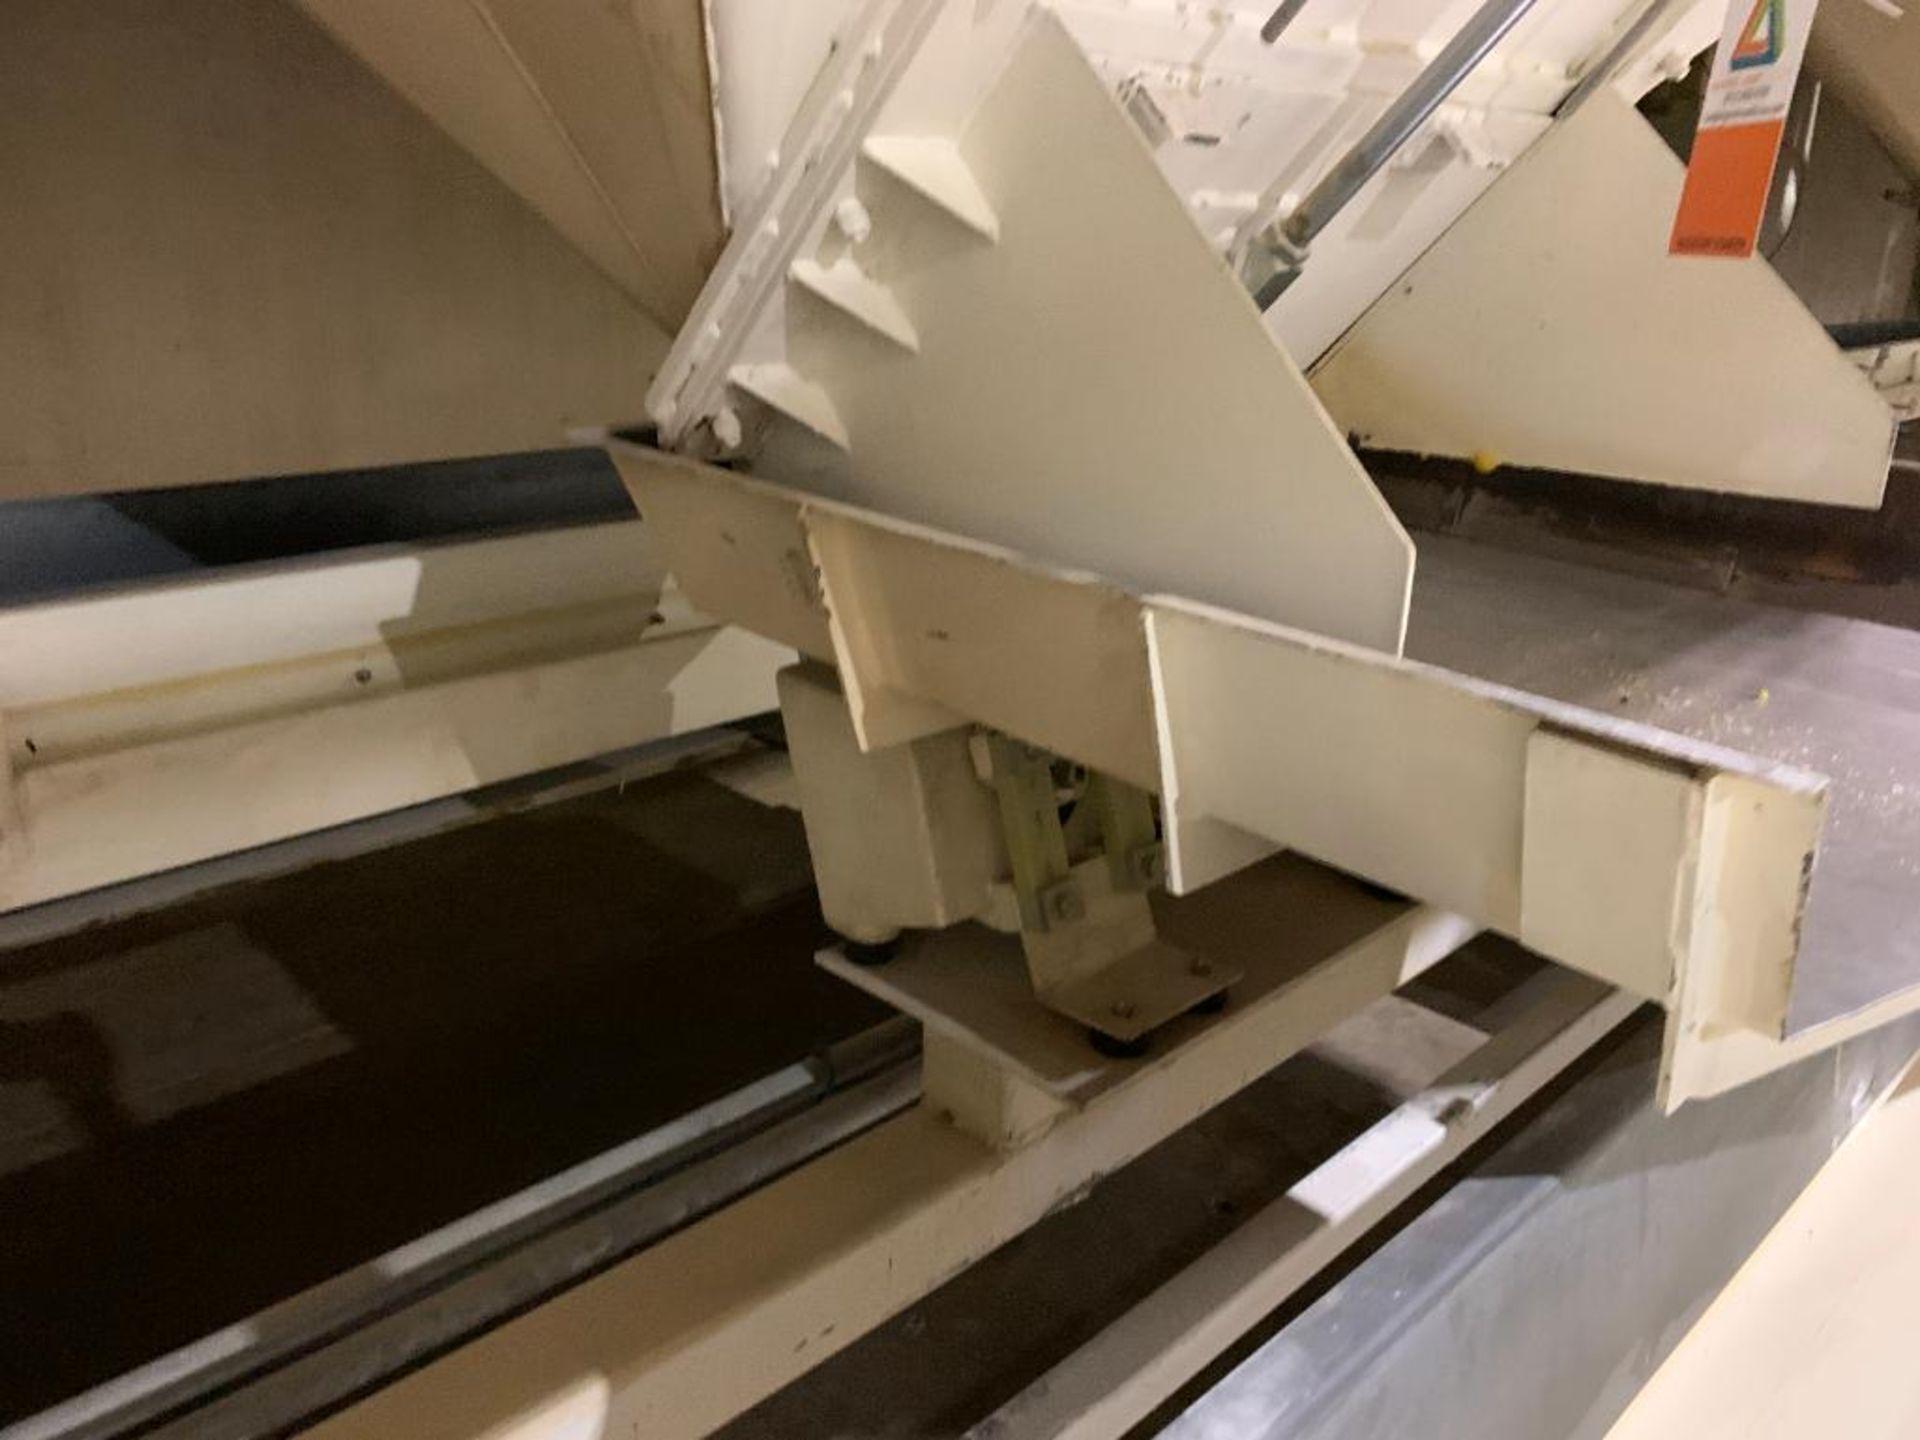 Aseeco mild steel cone bottom bulk storage bin - Image 16 of 25